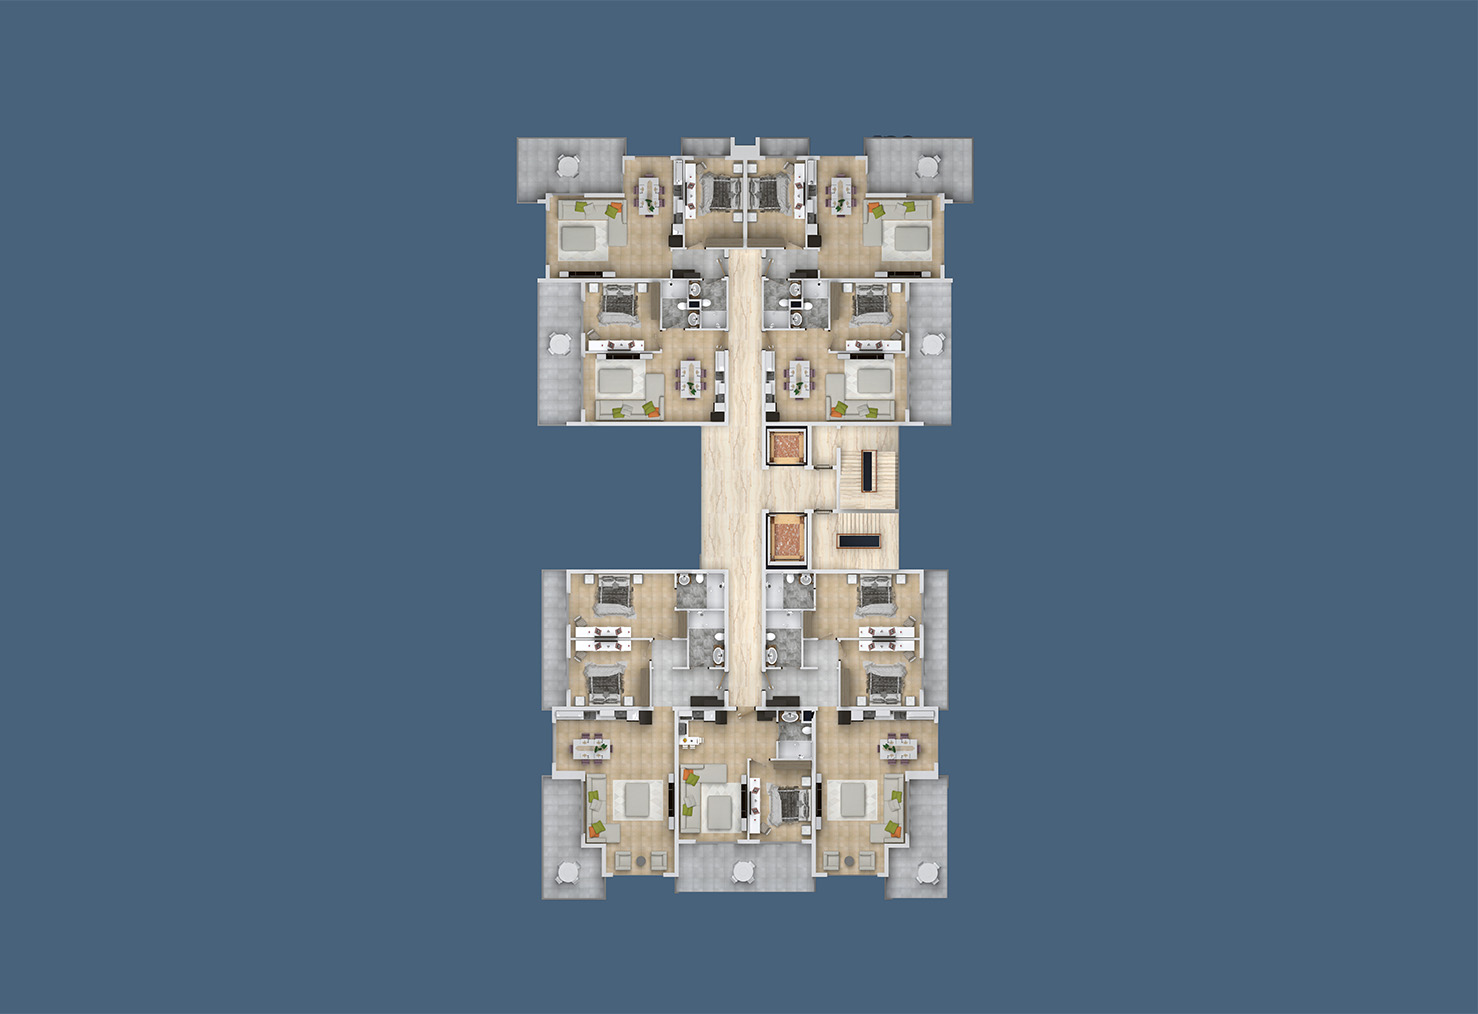 Floor plans of apartments 10 floor «C» Yekta Kingdom Trade Center